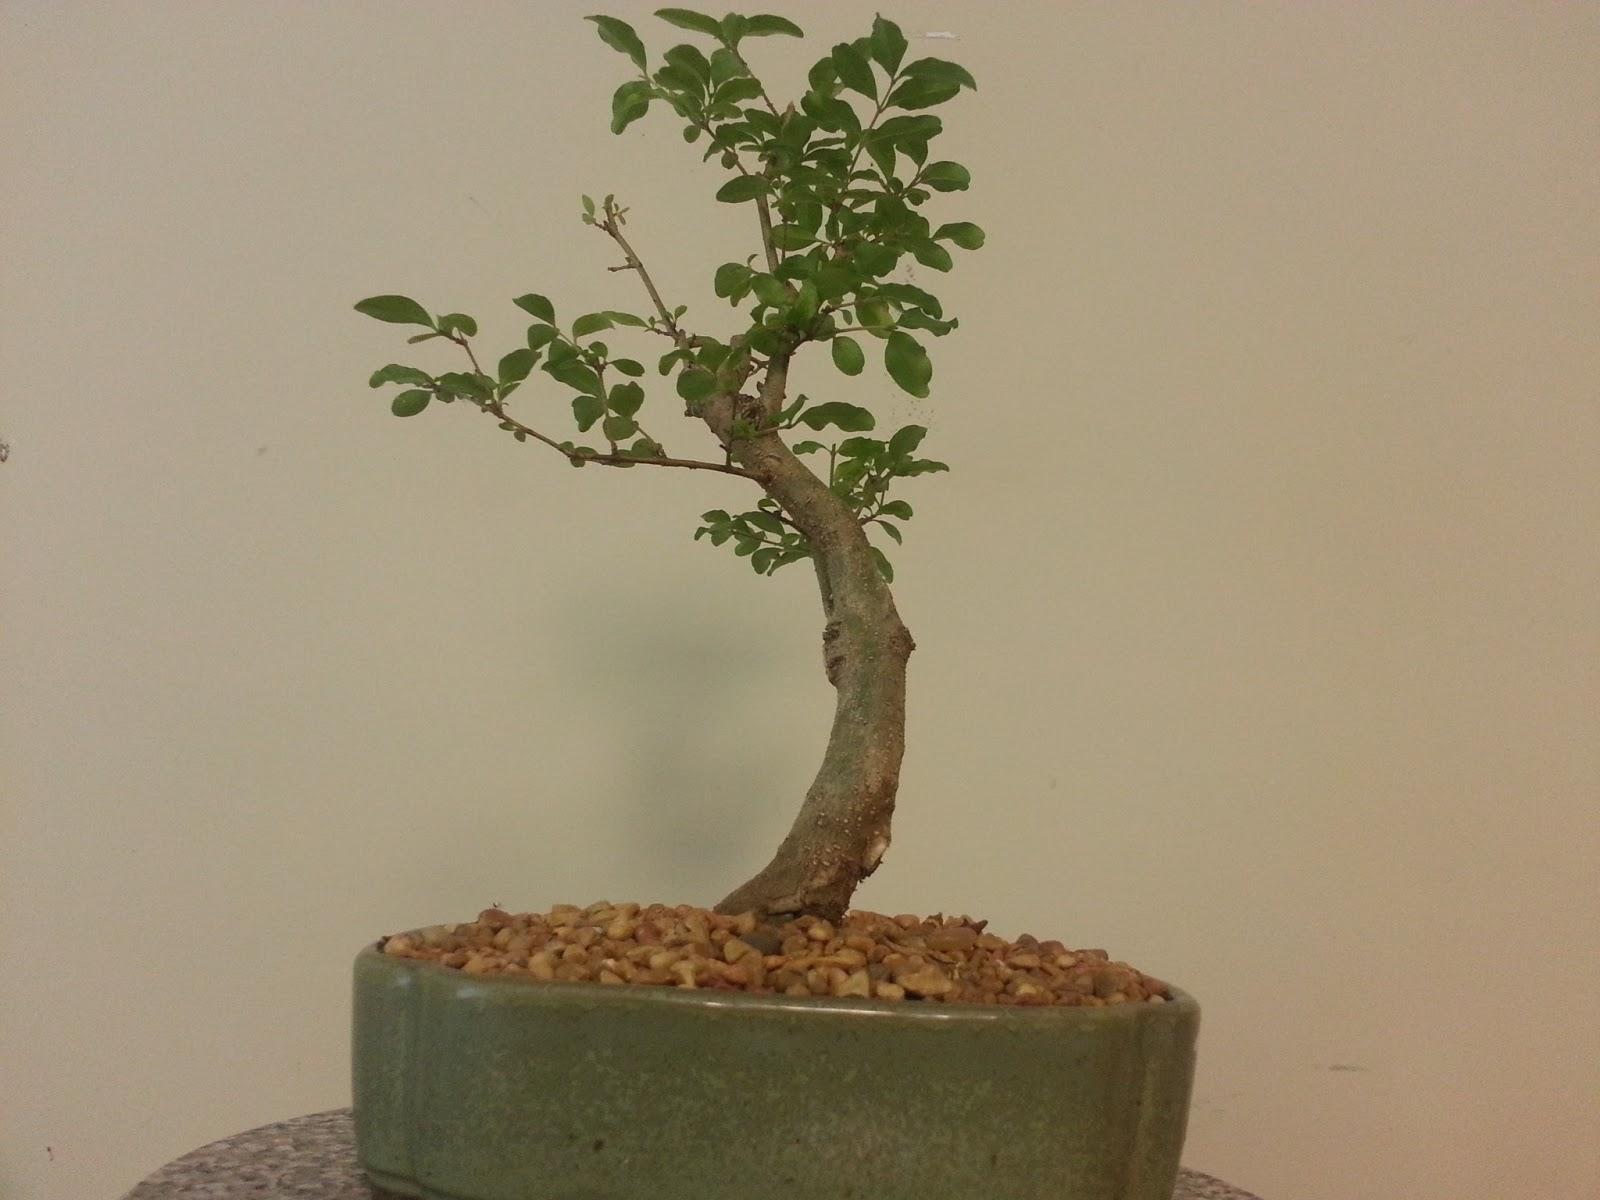 Bodhisattva Bonsai Smaller Informal Style Privet Bonsai A Bit